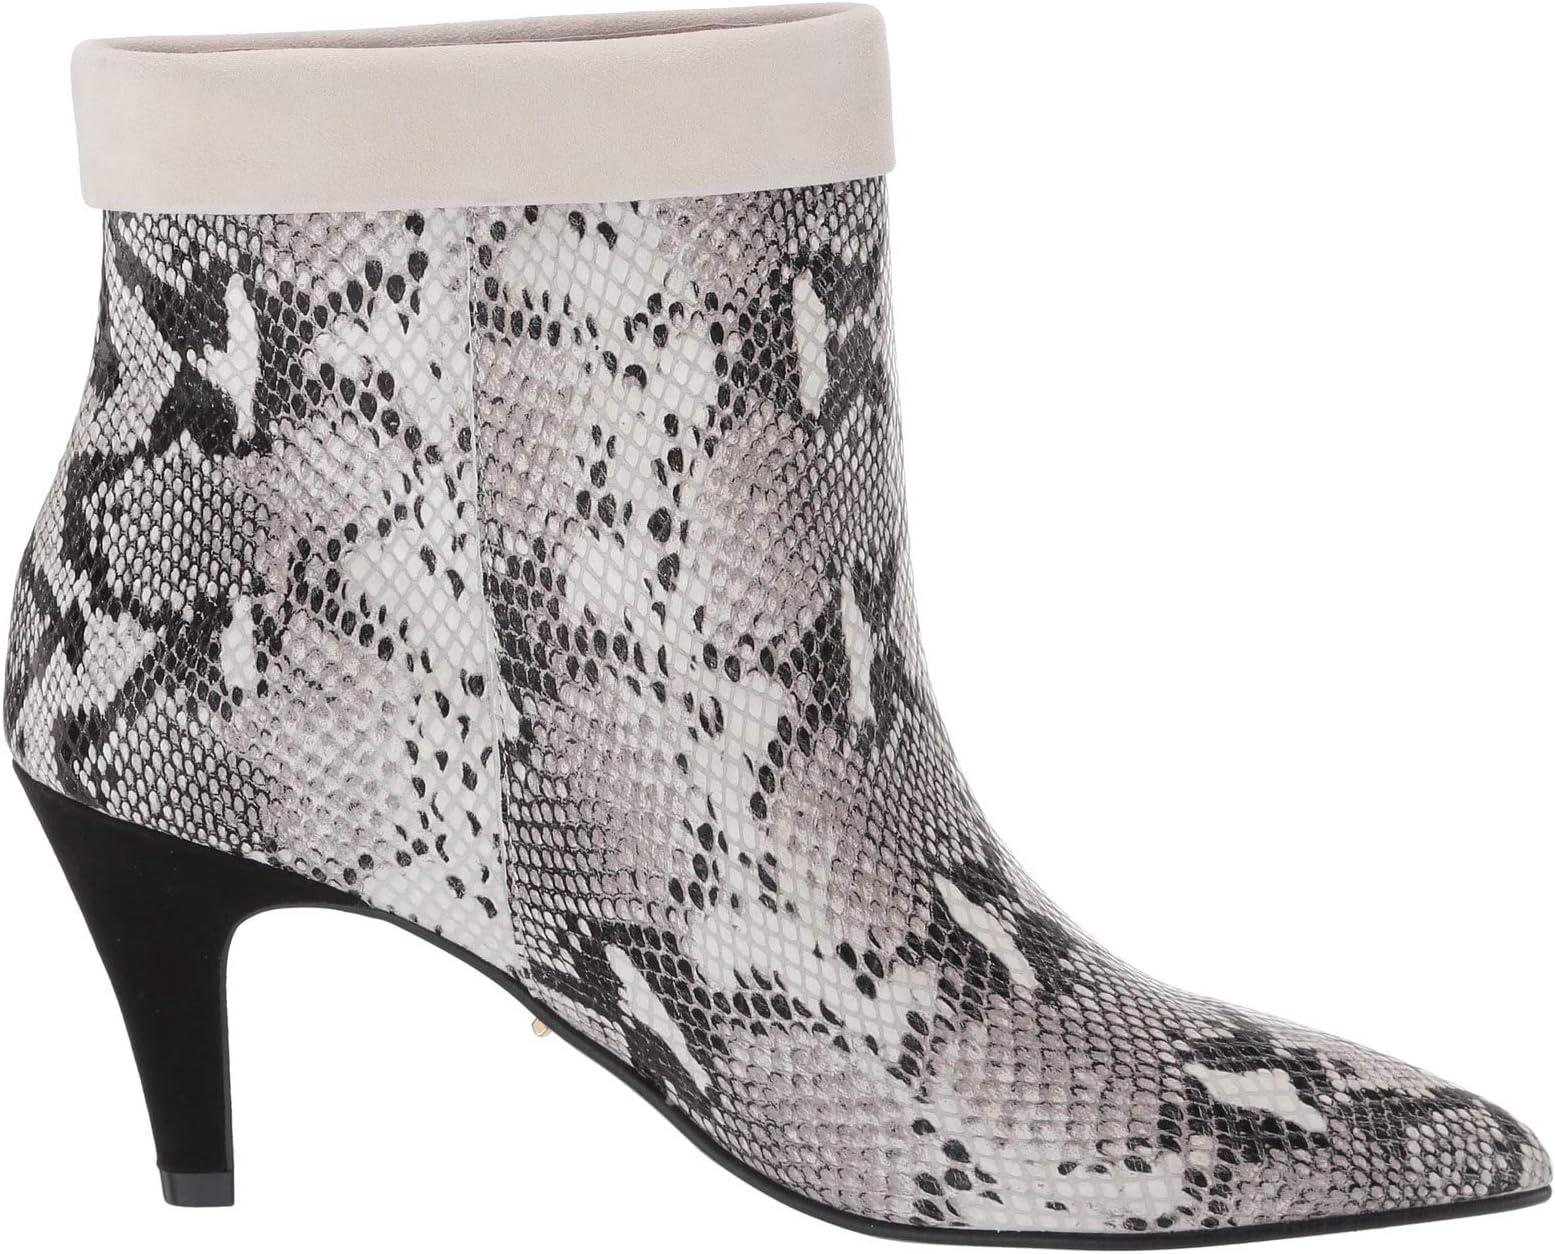 42 GOLD Ojai | Women's shoes | 2020 Newest